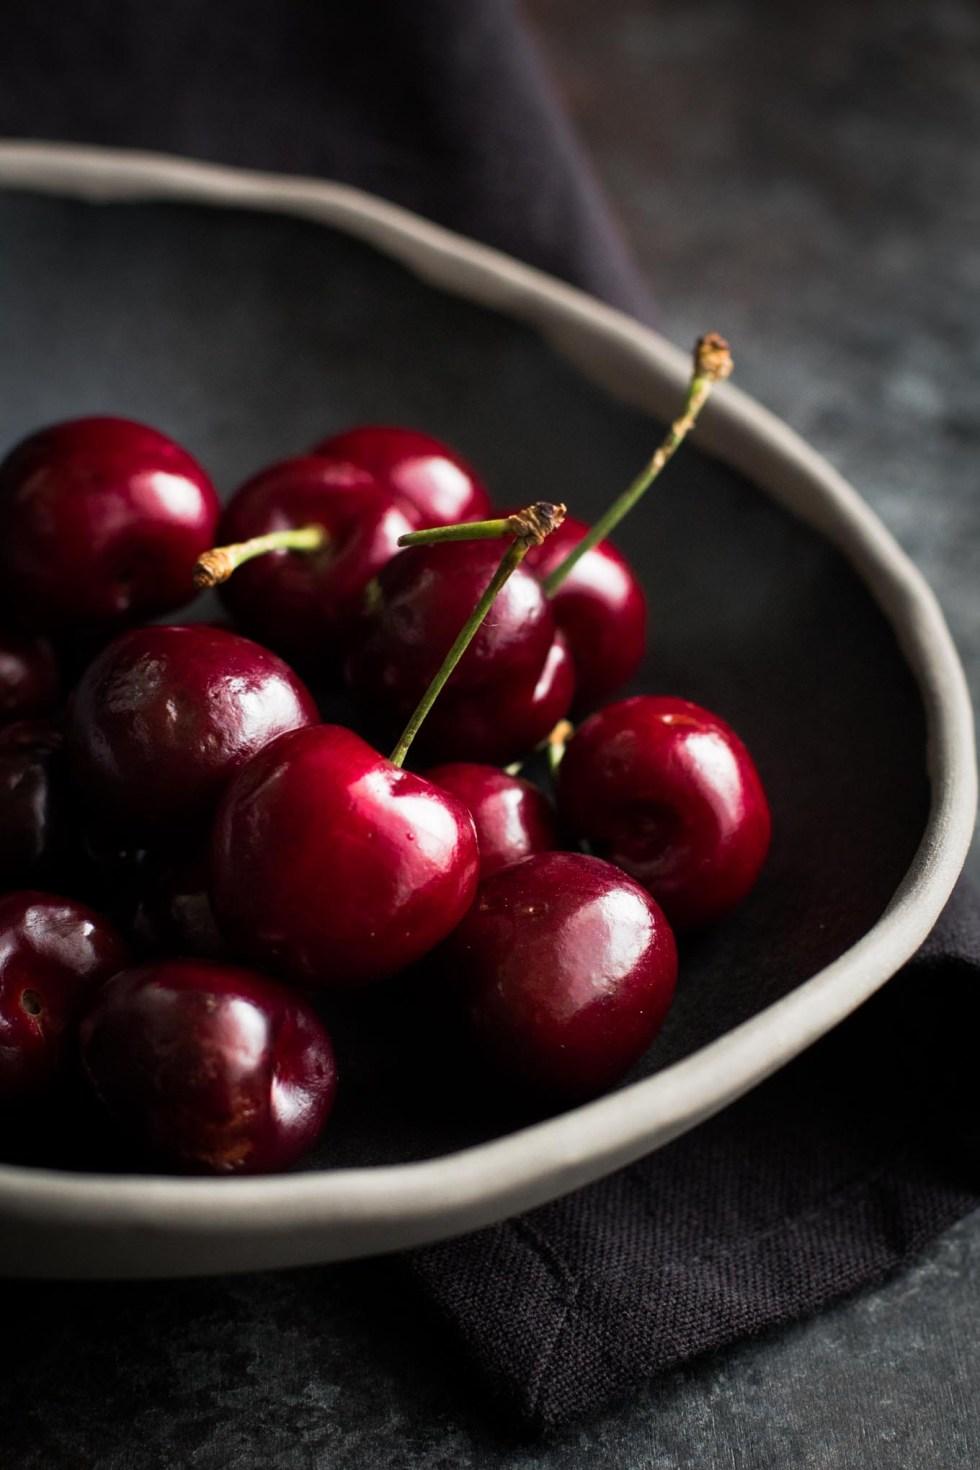 Fresh cherries in a black ceramic bowl